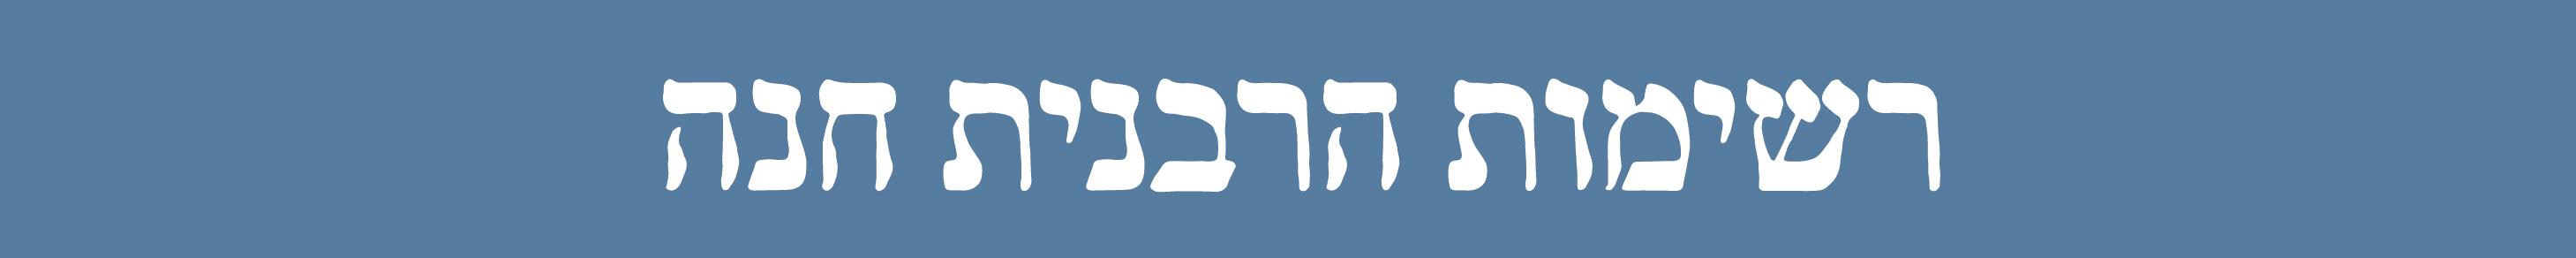 memoirs hebrew thinbanners-13iyar-11.jpg